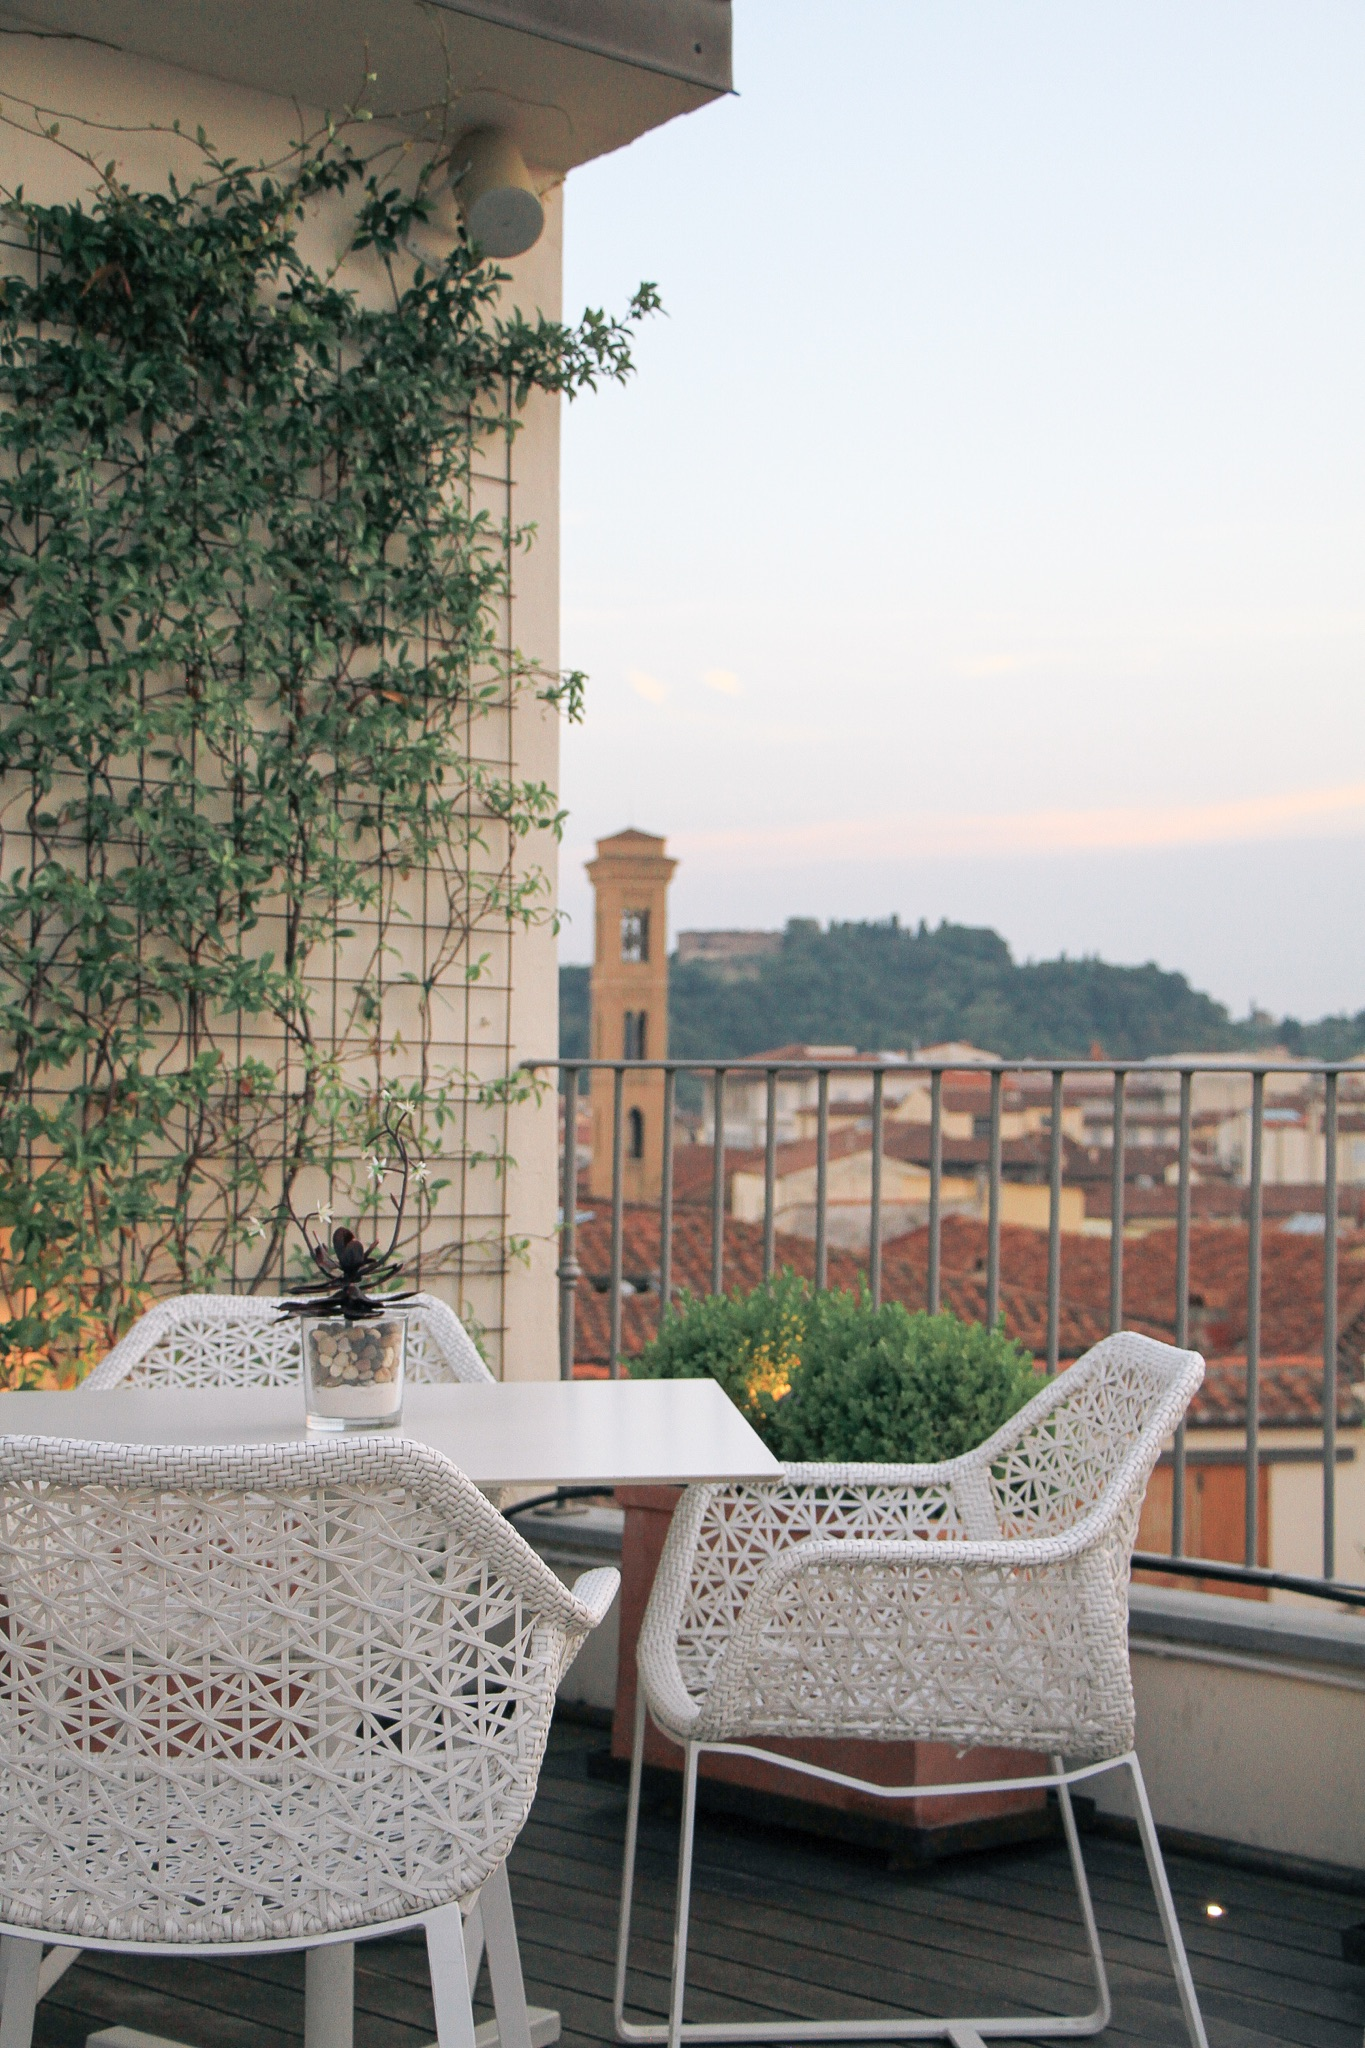 Ten-Days-Florence-Tuscany-Travel-Guide-MonicaFrancis-6